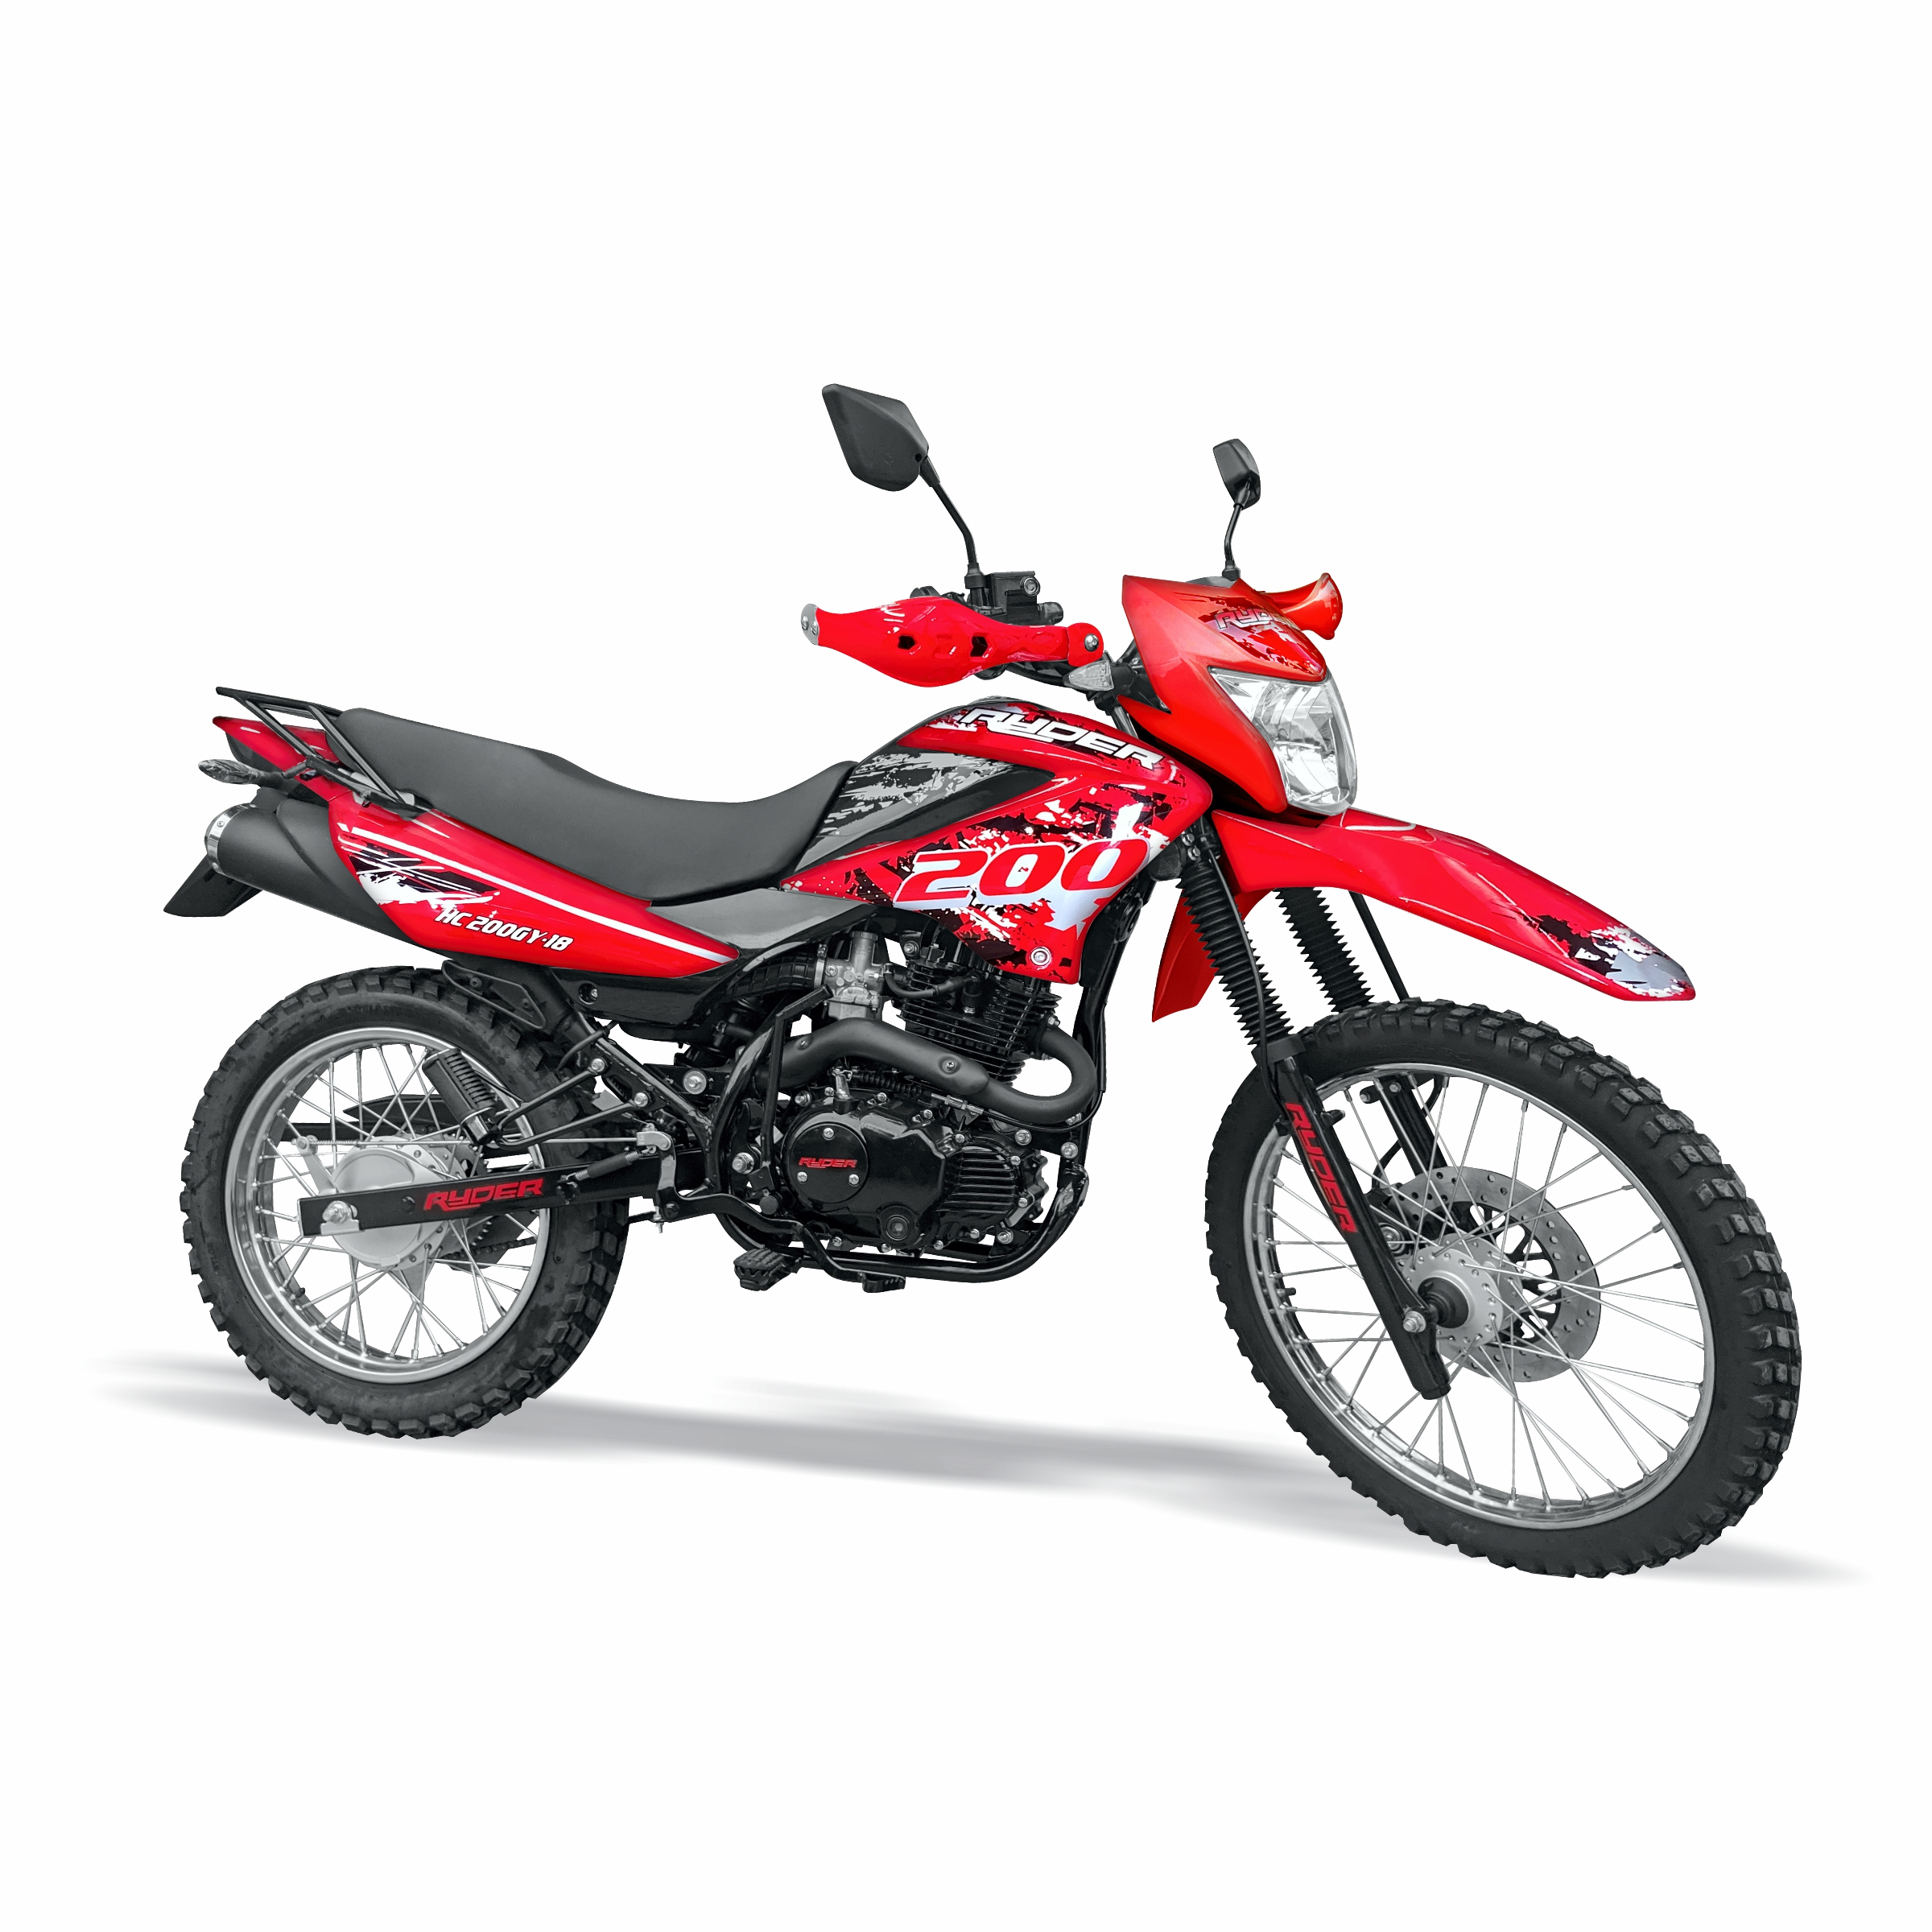 MOTO 200 RYDER HC200GY-18